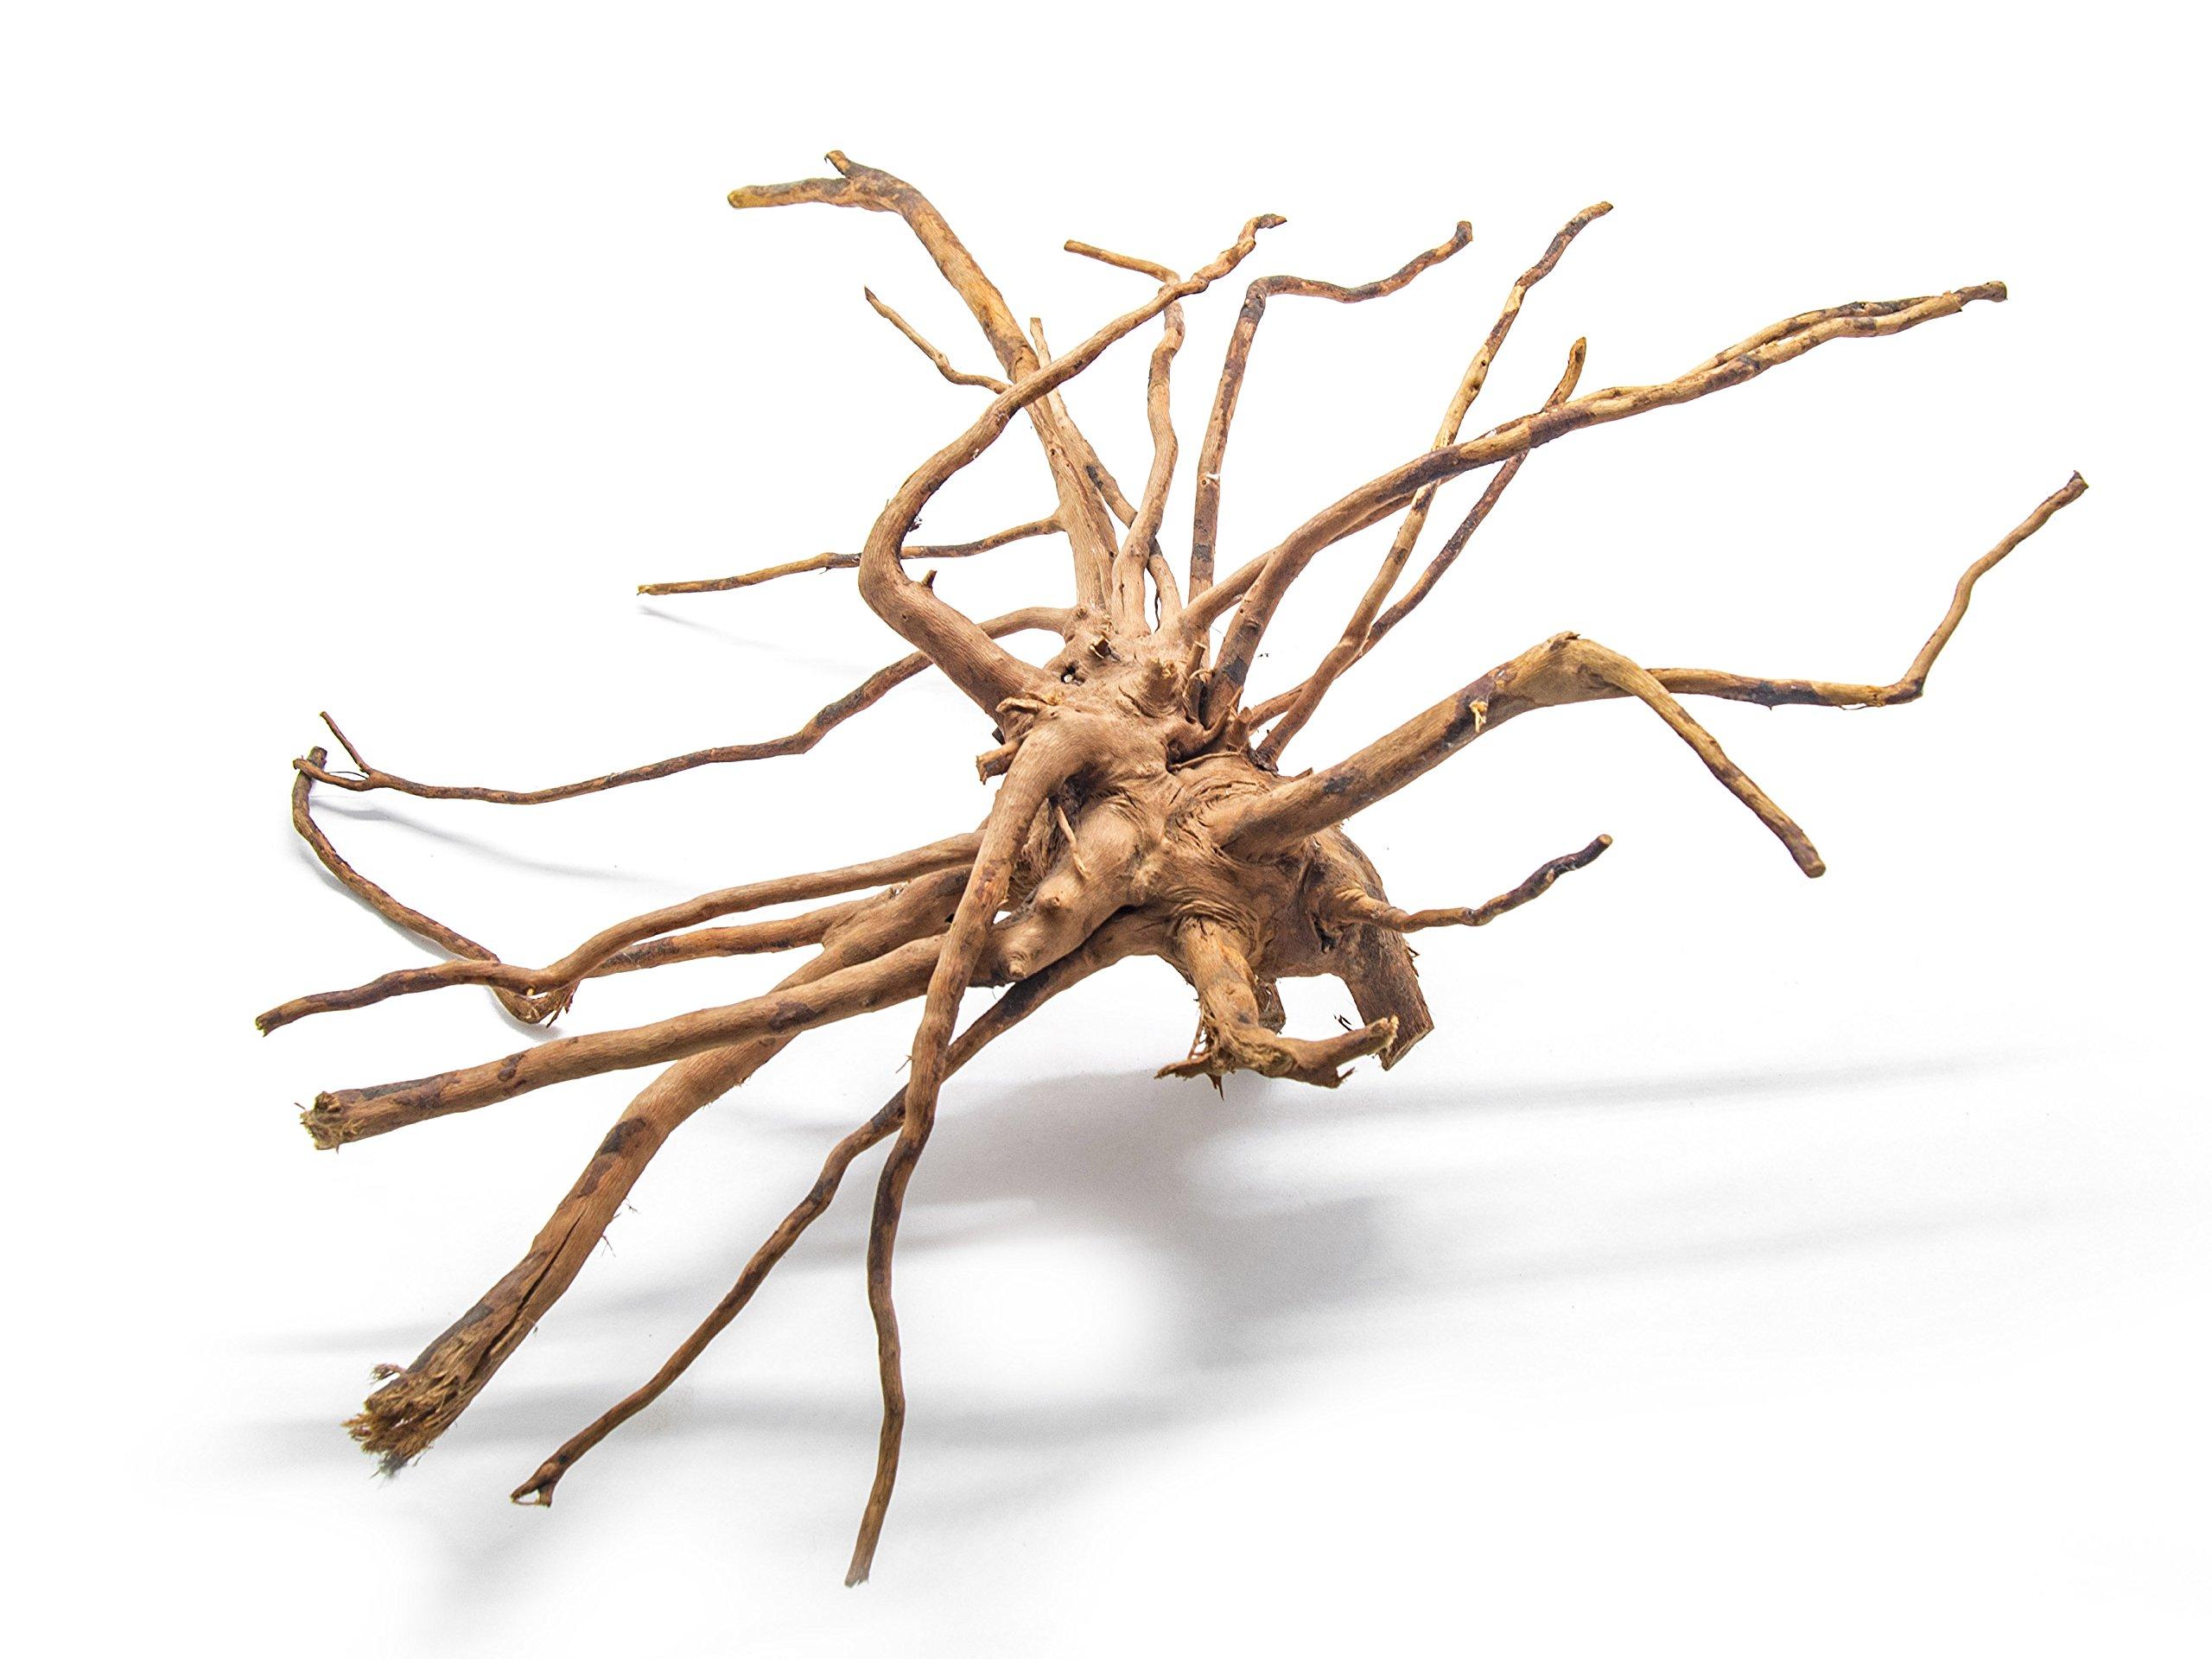 Aquatic Arts 1 Large Piece of Spider Wood aka Azalea Natural Aquarium Driftwood, 14-16''